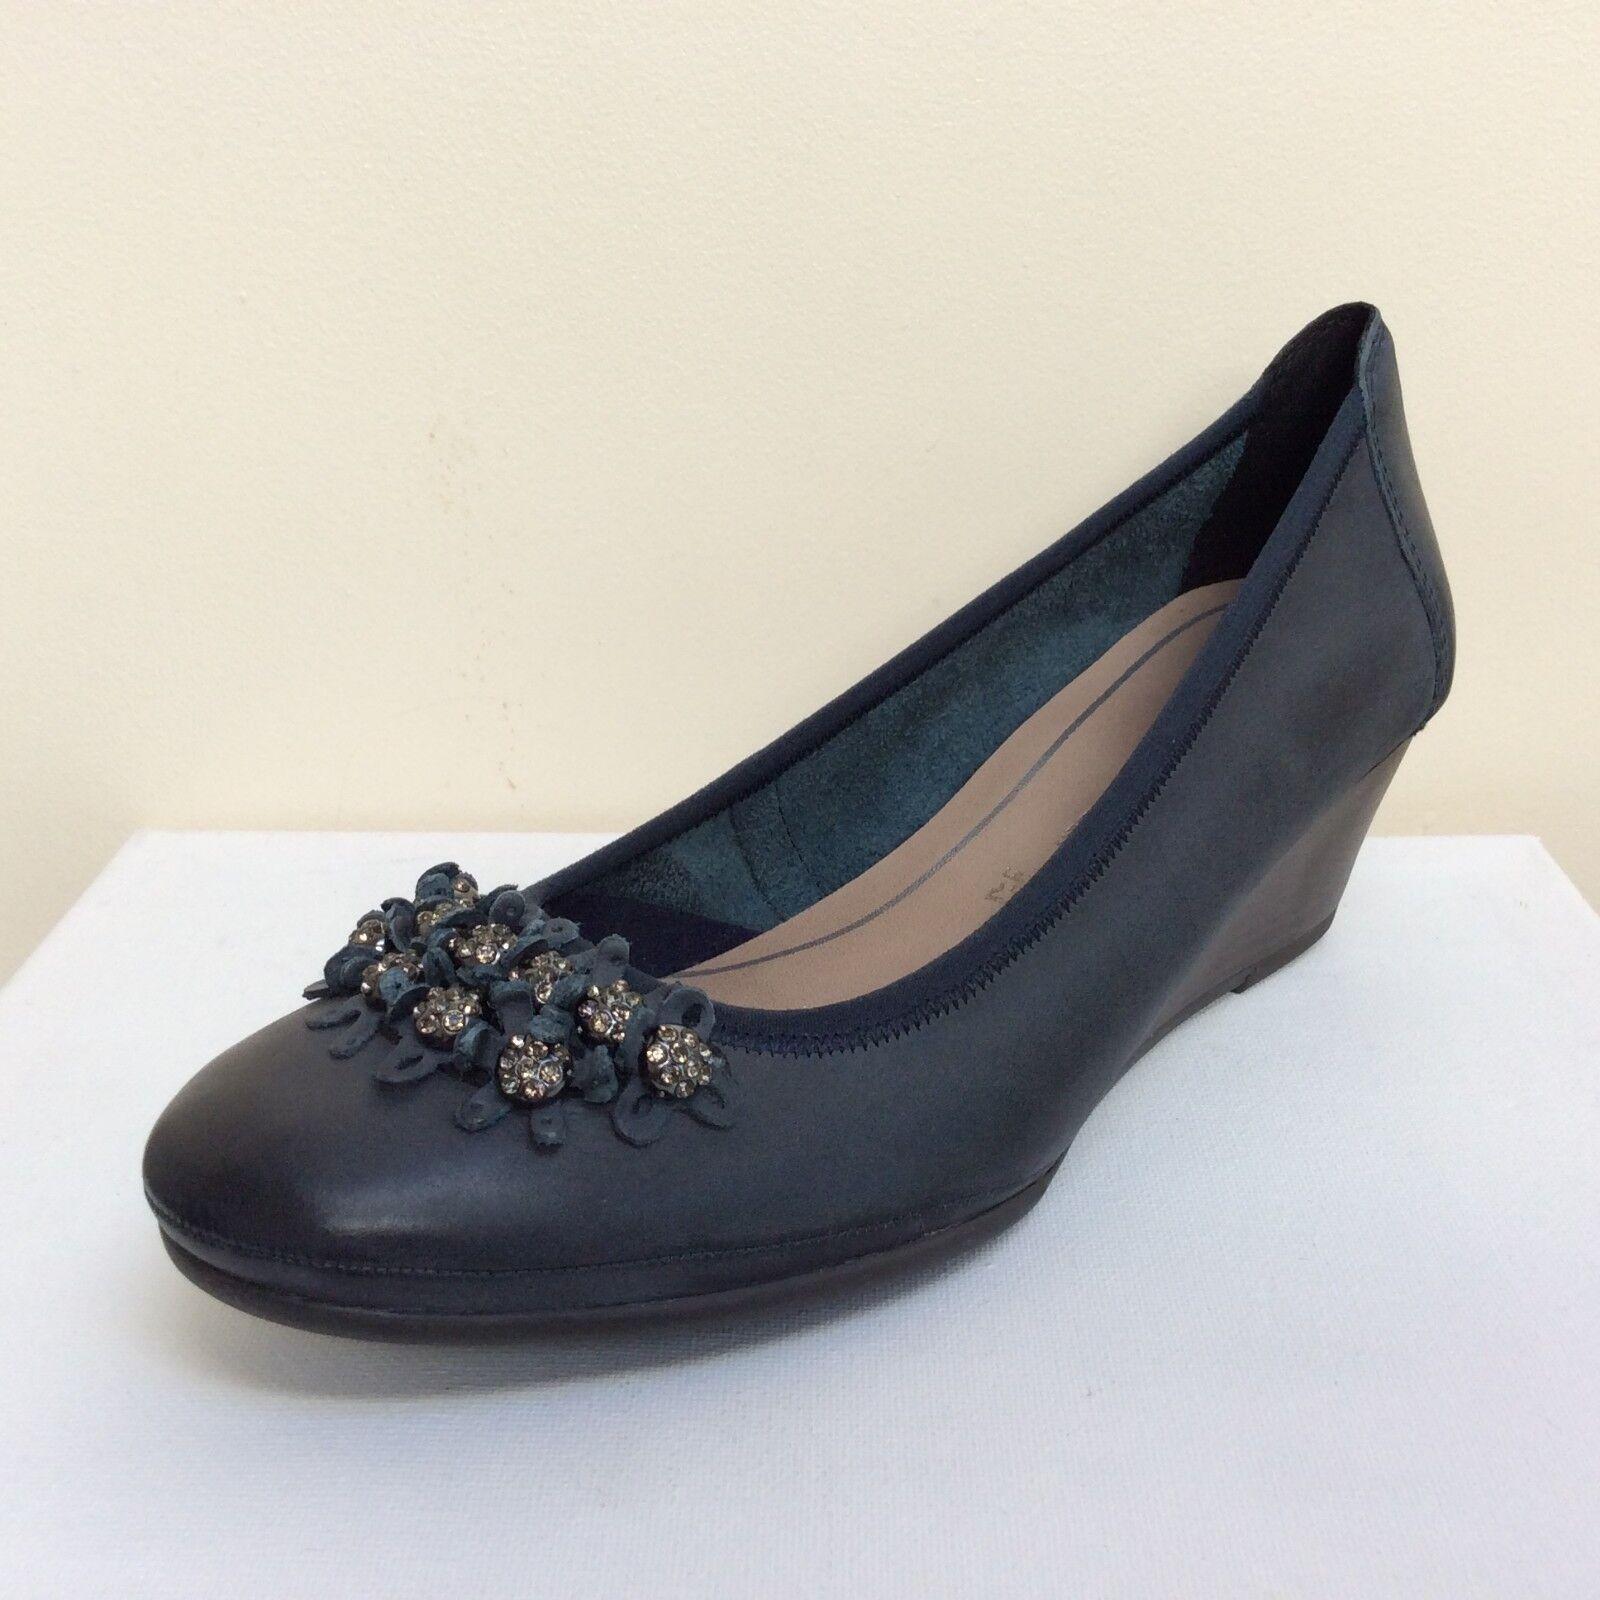 Marco Tozzi Azul Marino Cuero acuñada adornado Tribunal Zapatos, Reino Unido 8 // BNWB